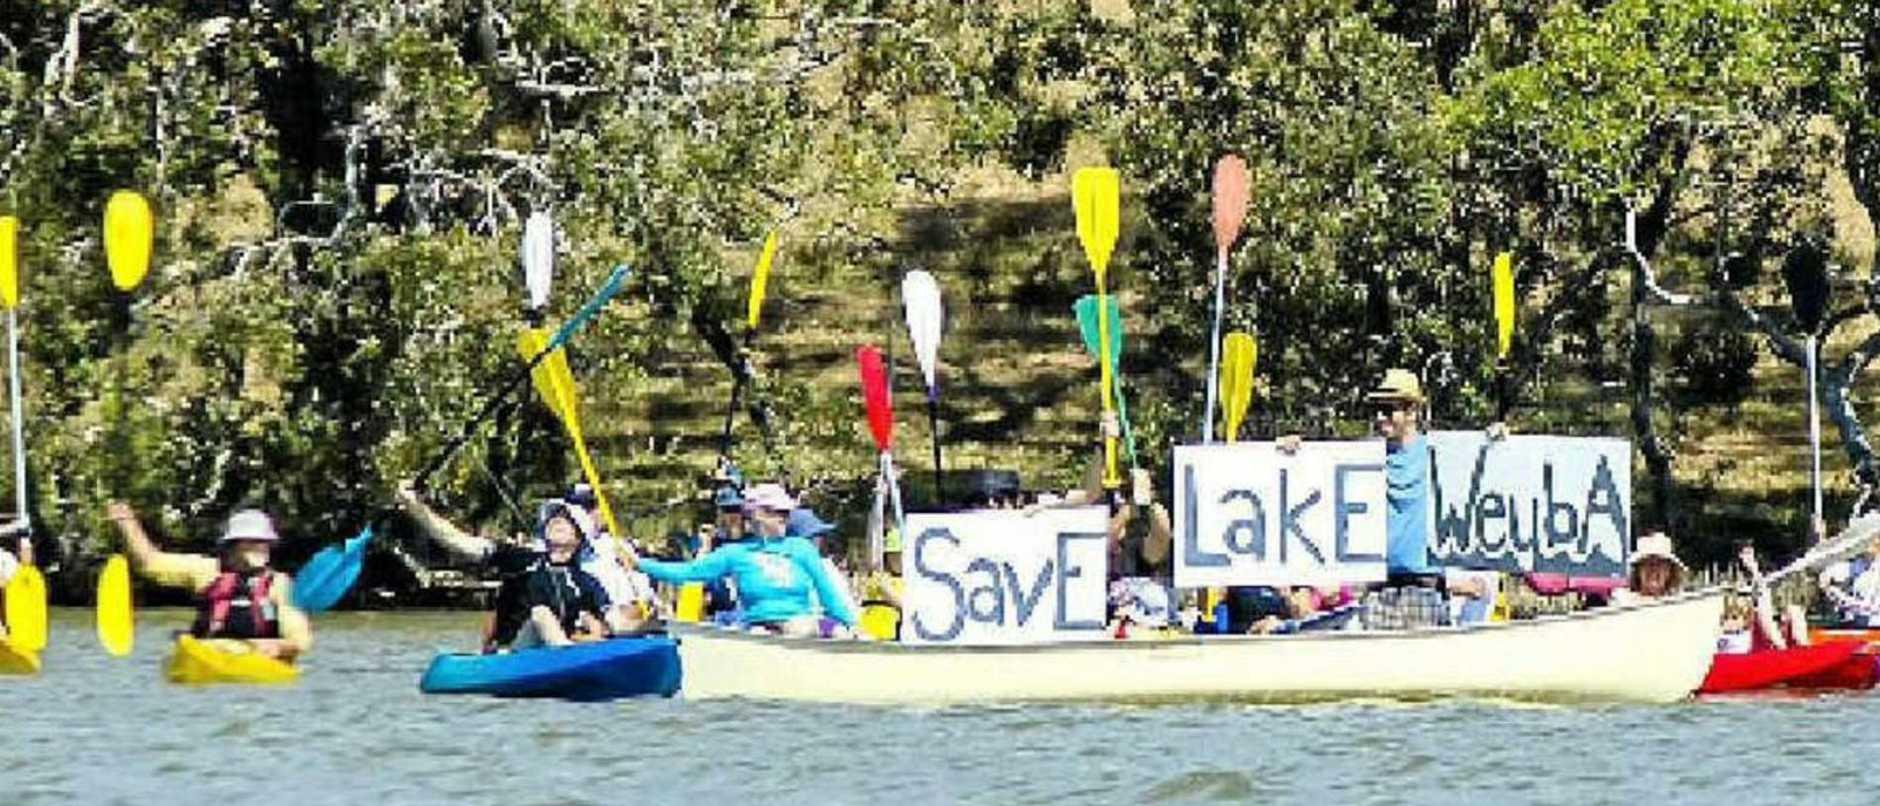 Friends of Lake Weyba make their feelings clear.